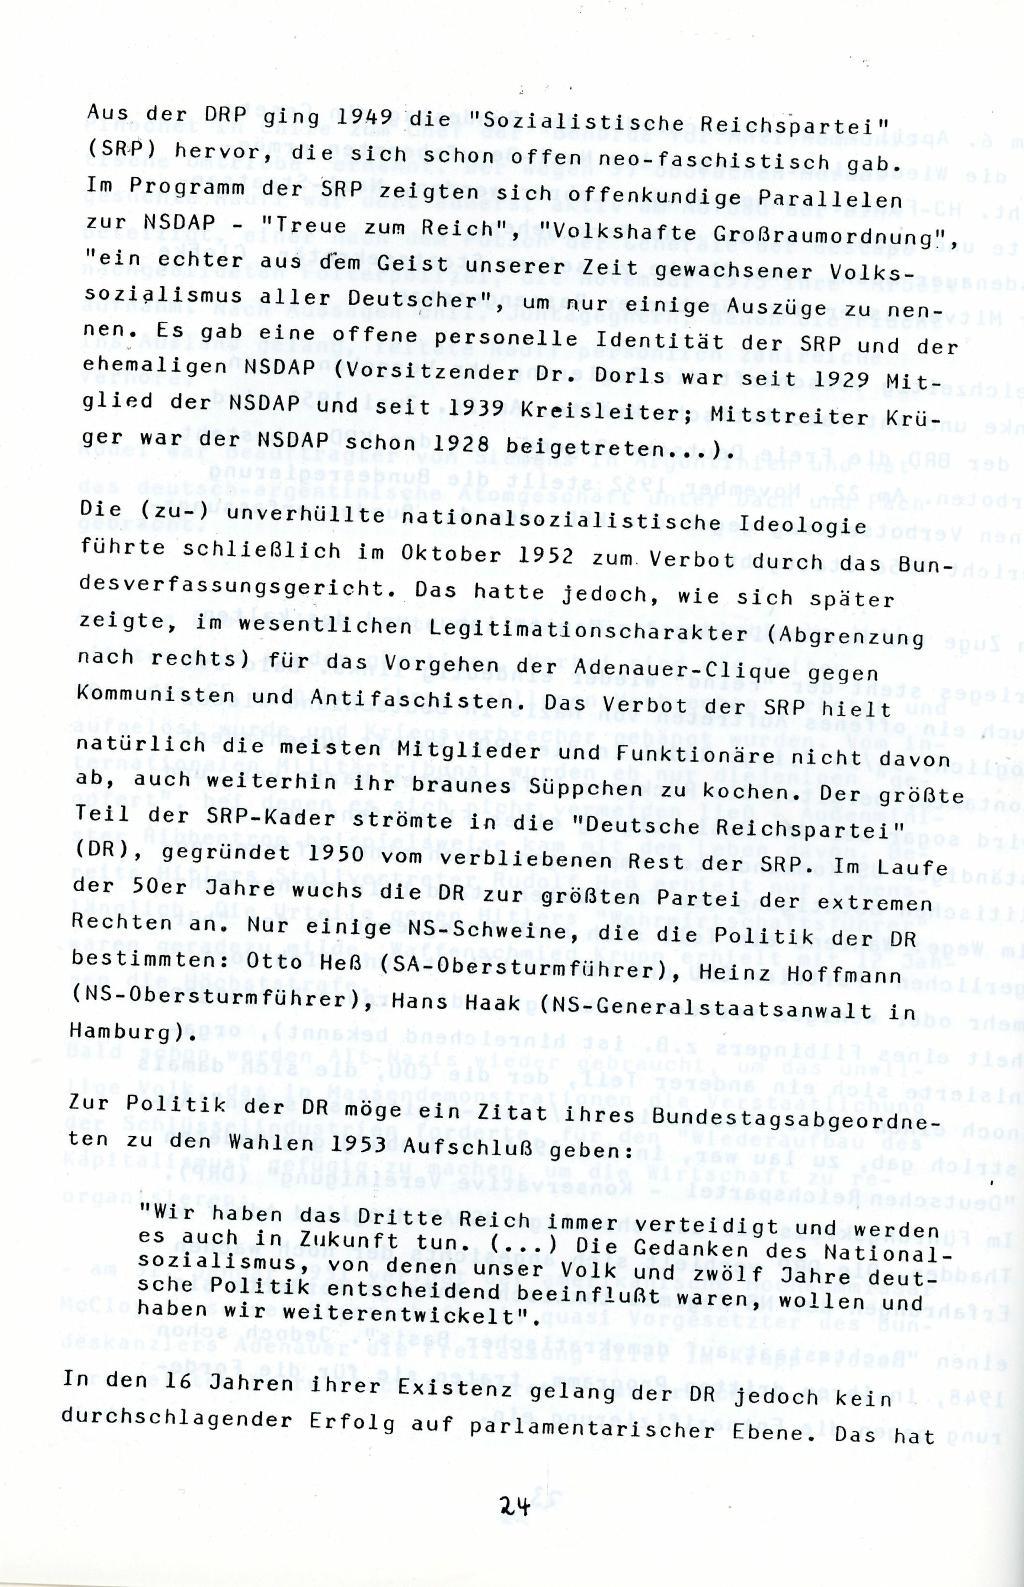 Berlin_1983_Autonome_Gruppen_Faschismus_im_Kapitalismus_24